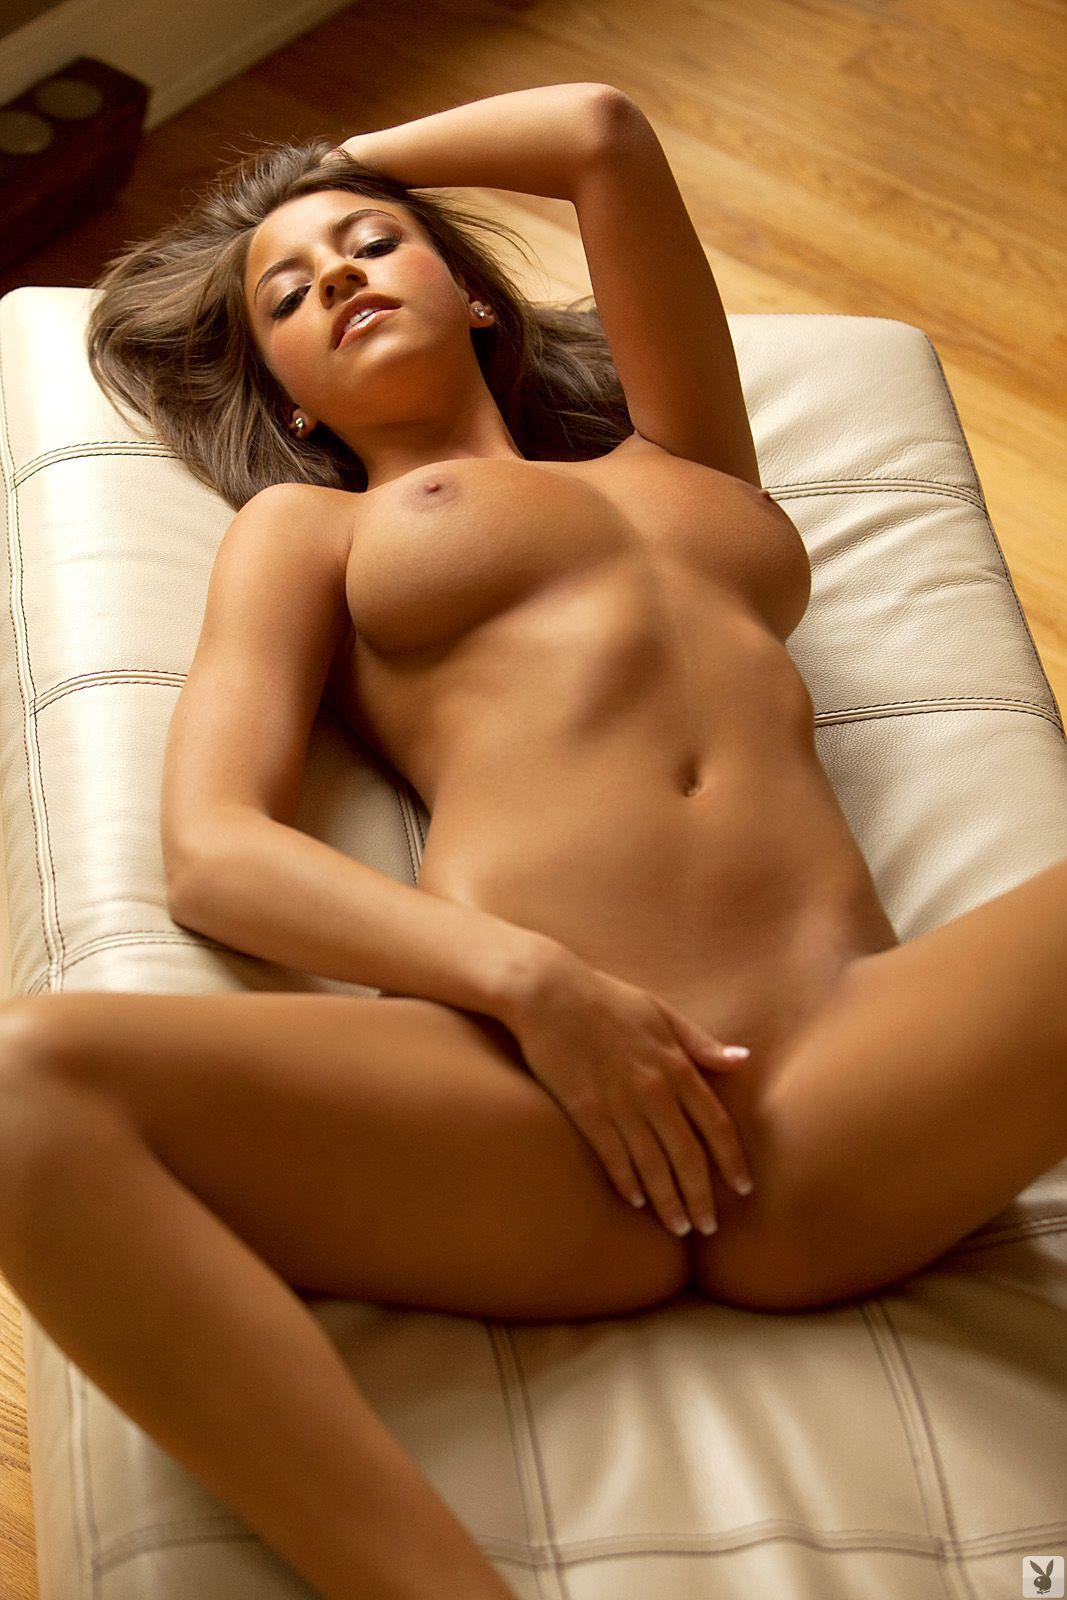 luchshaya-figura-porno-foto